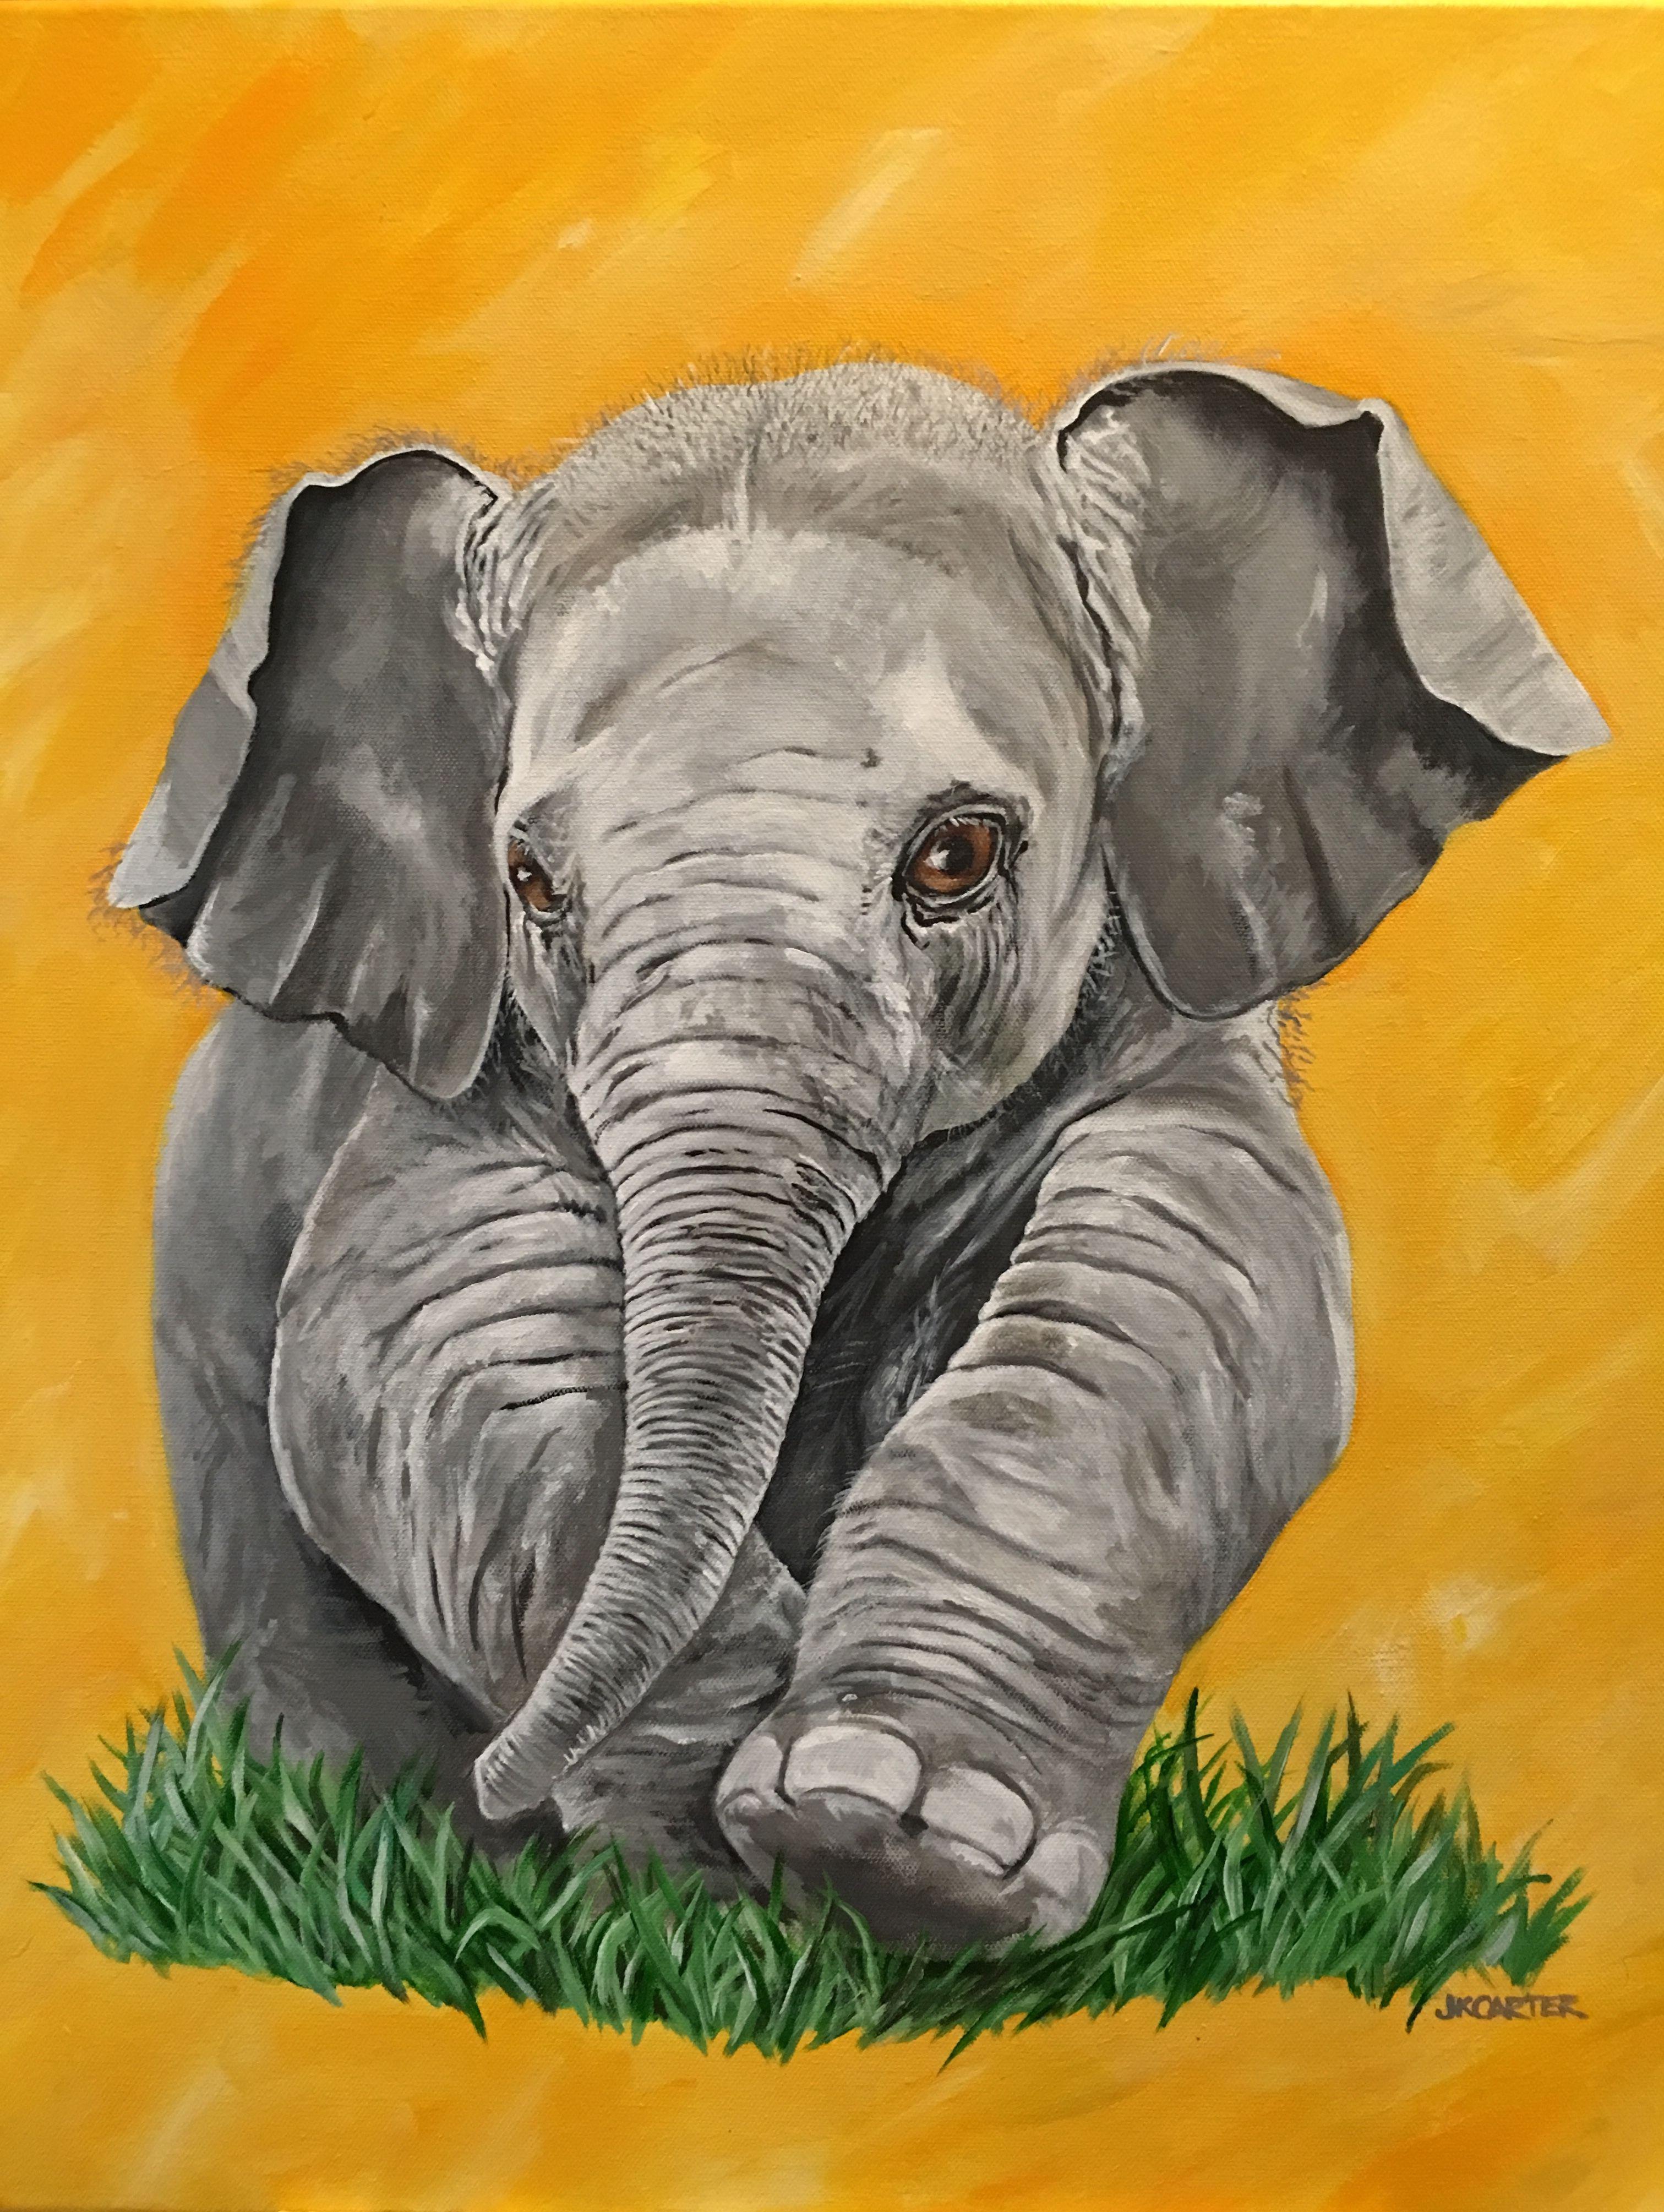 Baby Elephant Nursery art Acrylic painting on canvas by JKCARTER